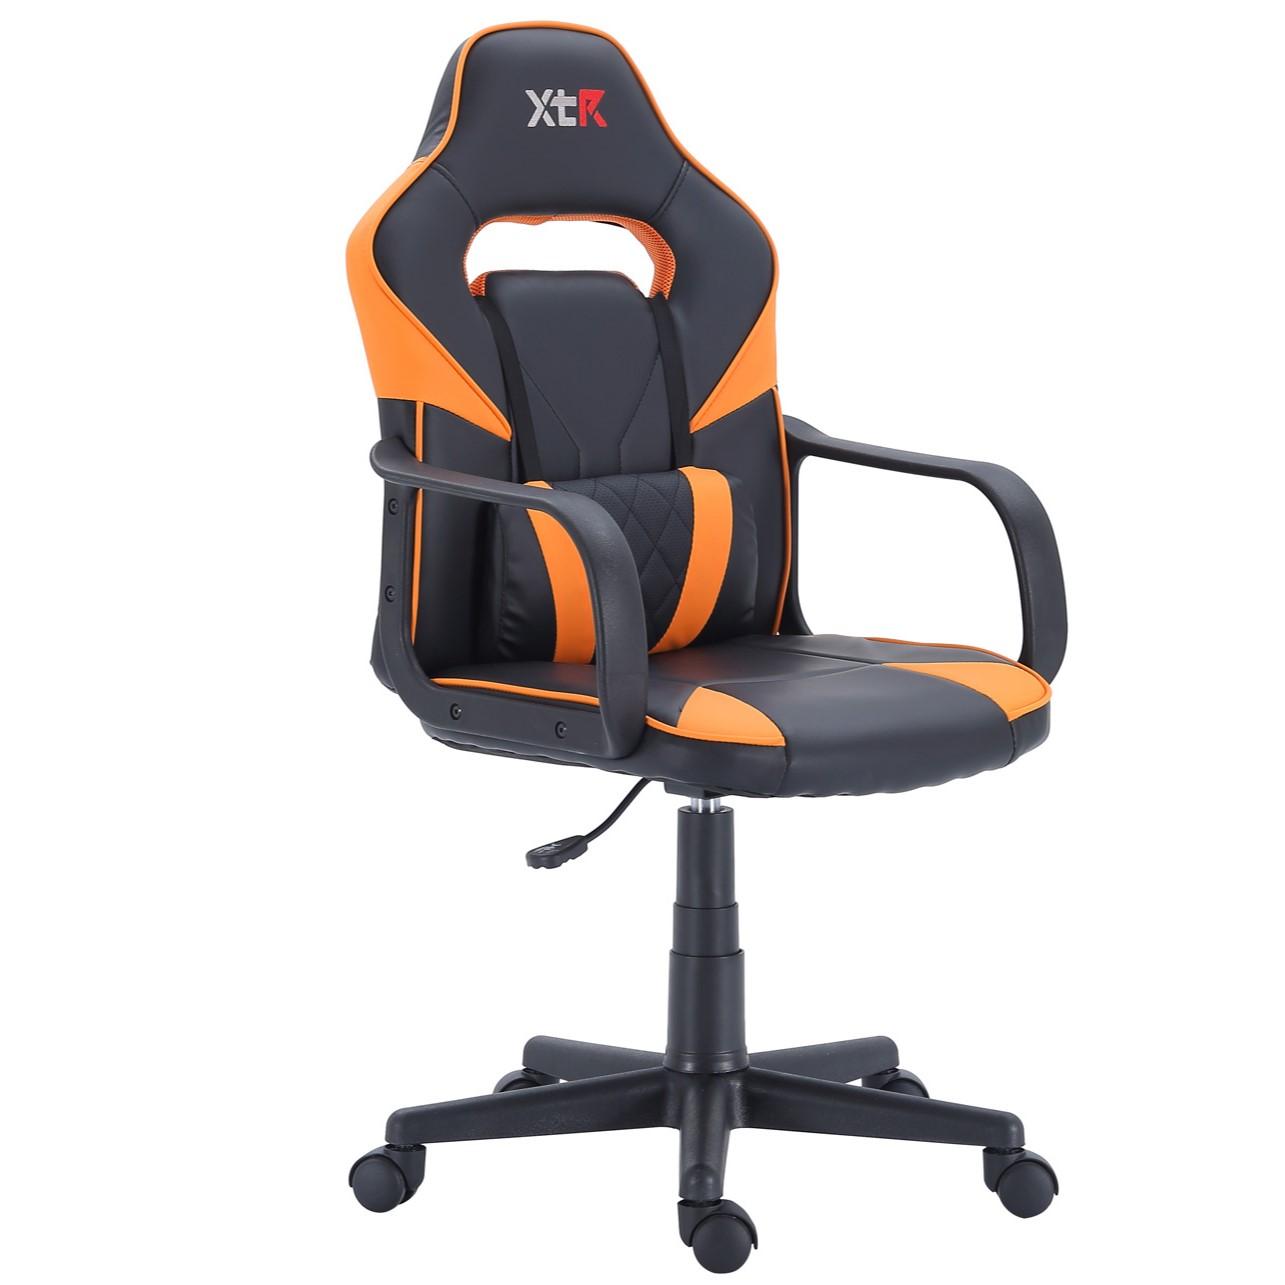 Sillón Gamer XTR Naranja / Negro